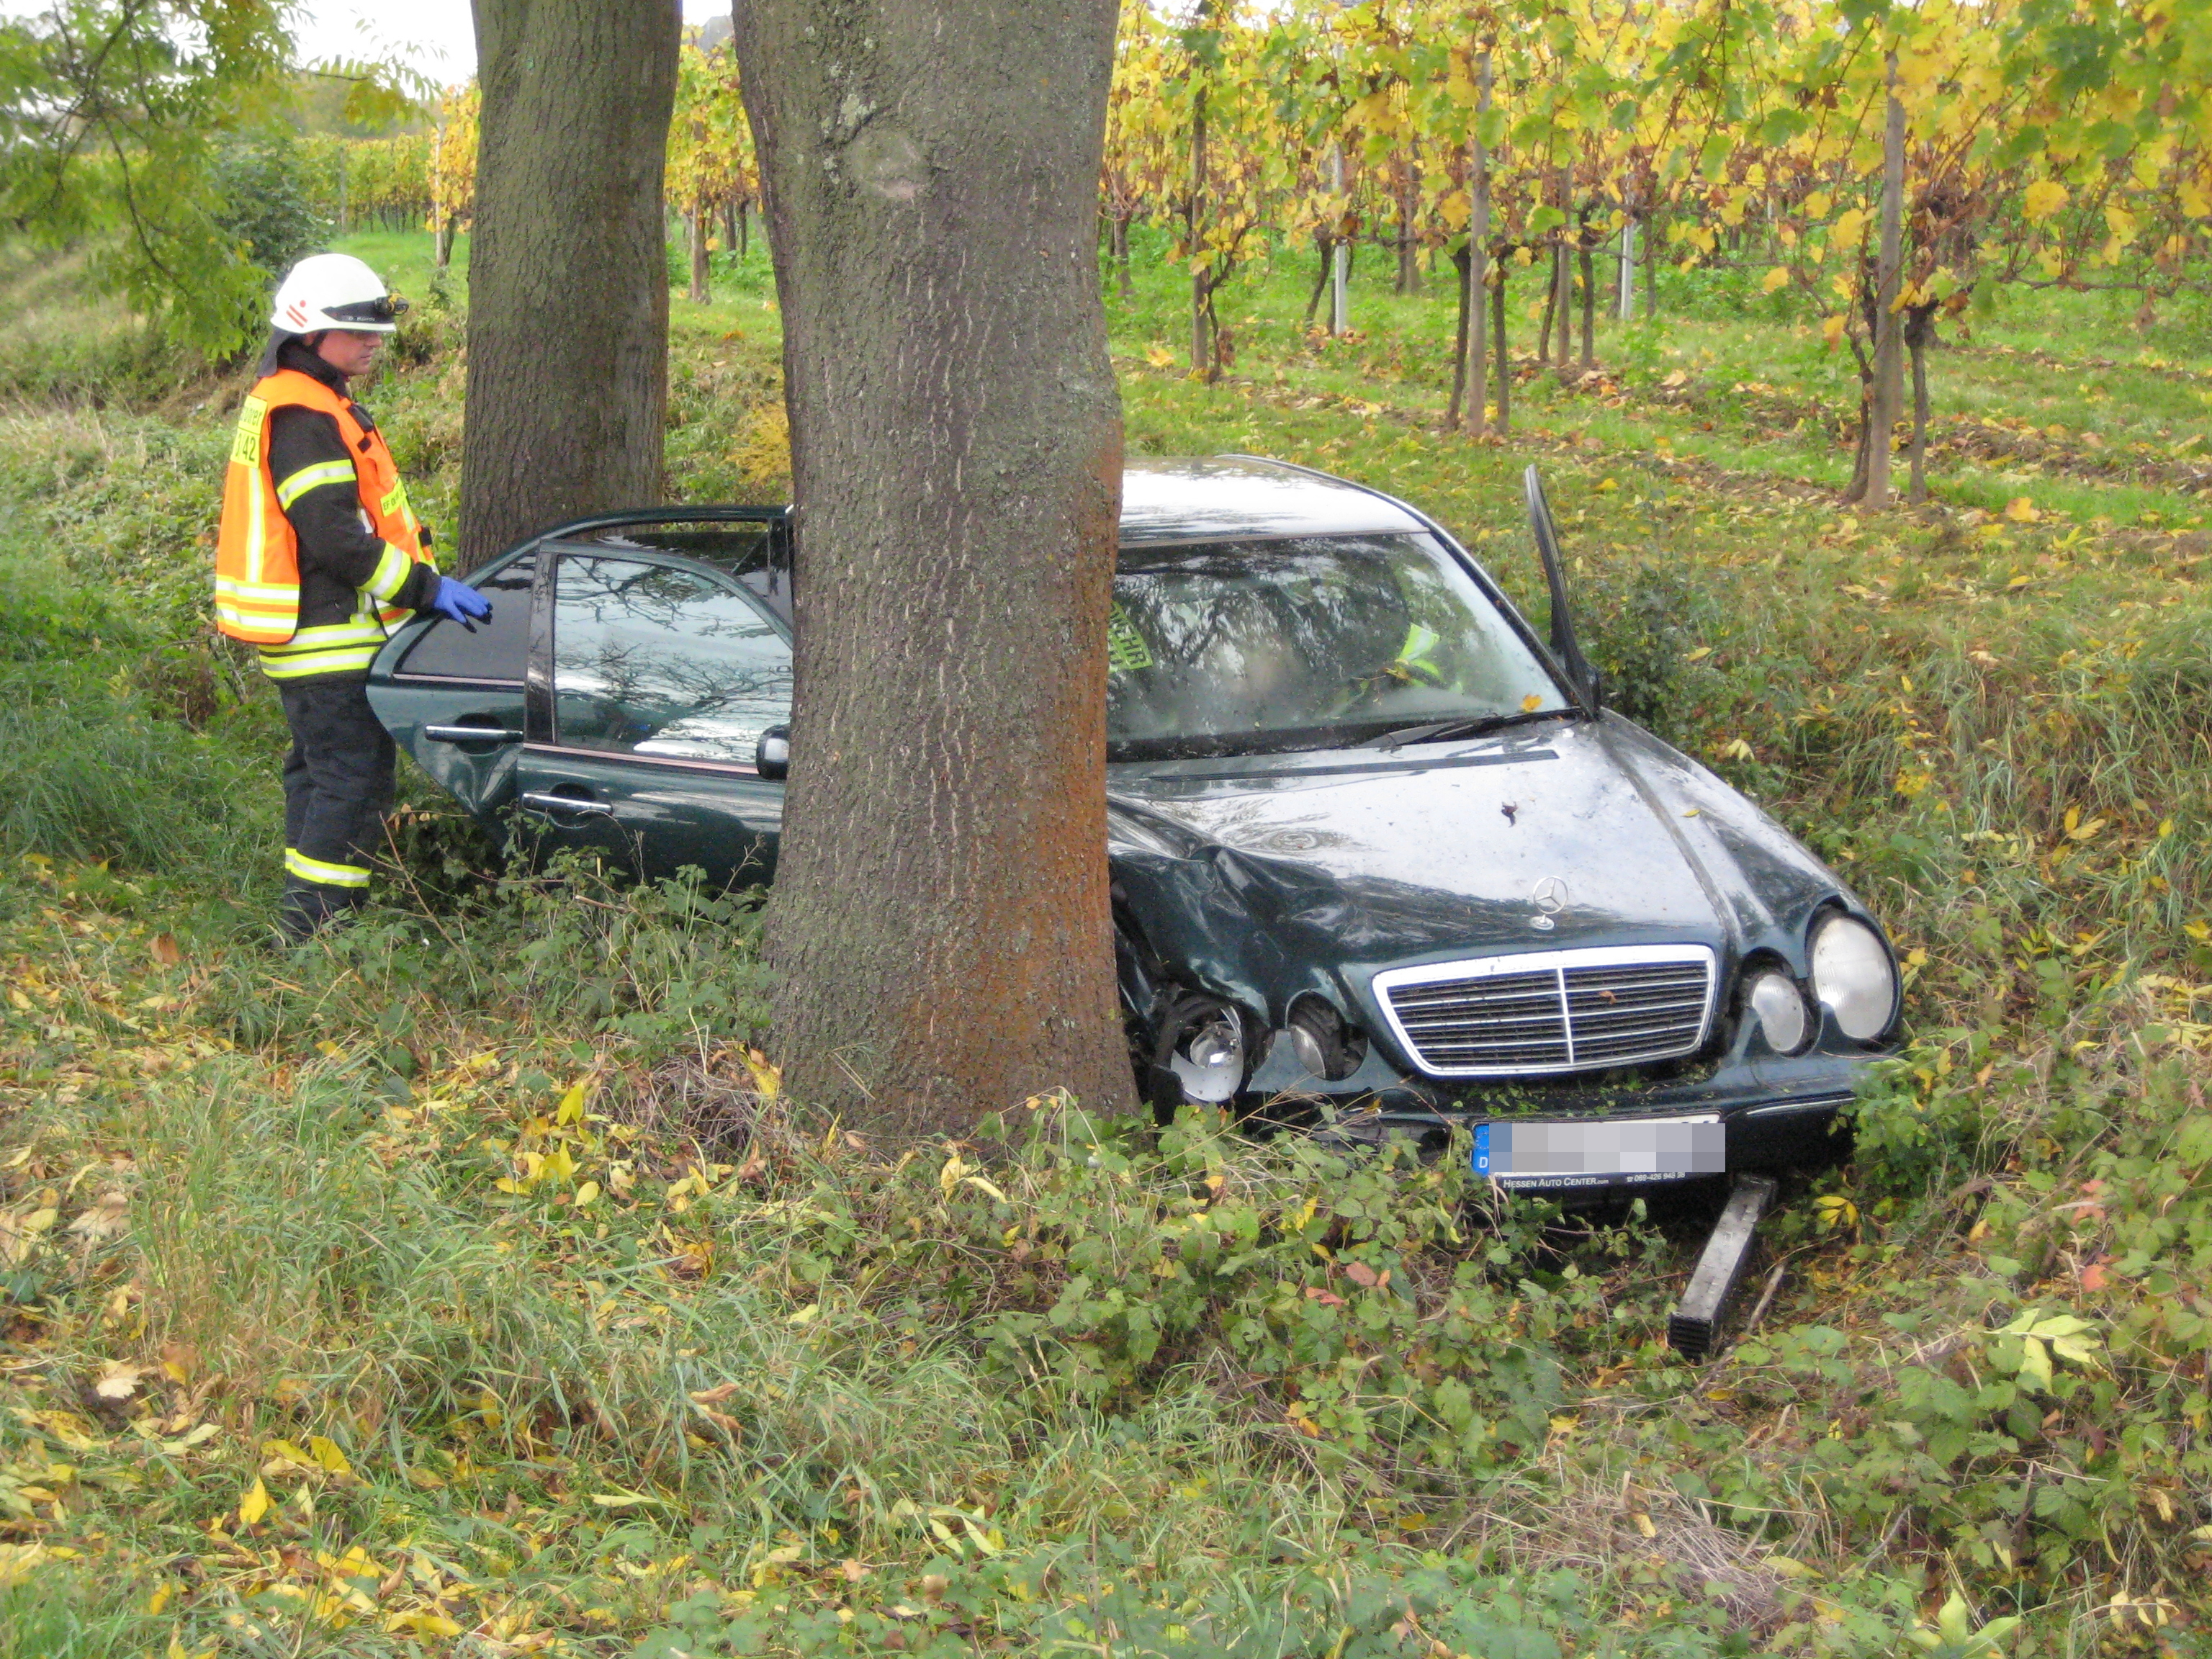 Vekehrsunfall Oestrich